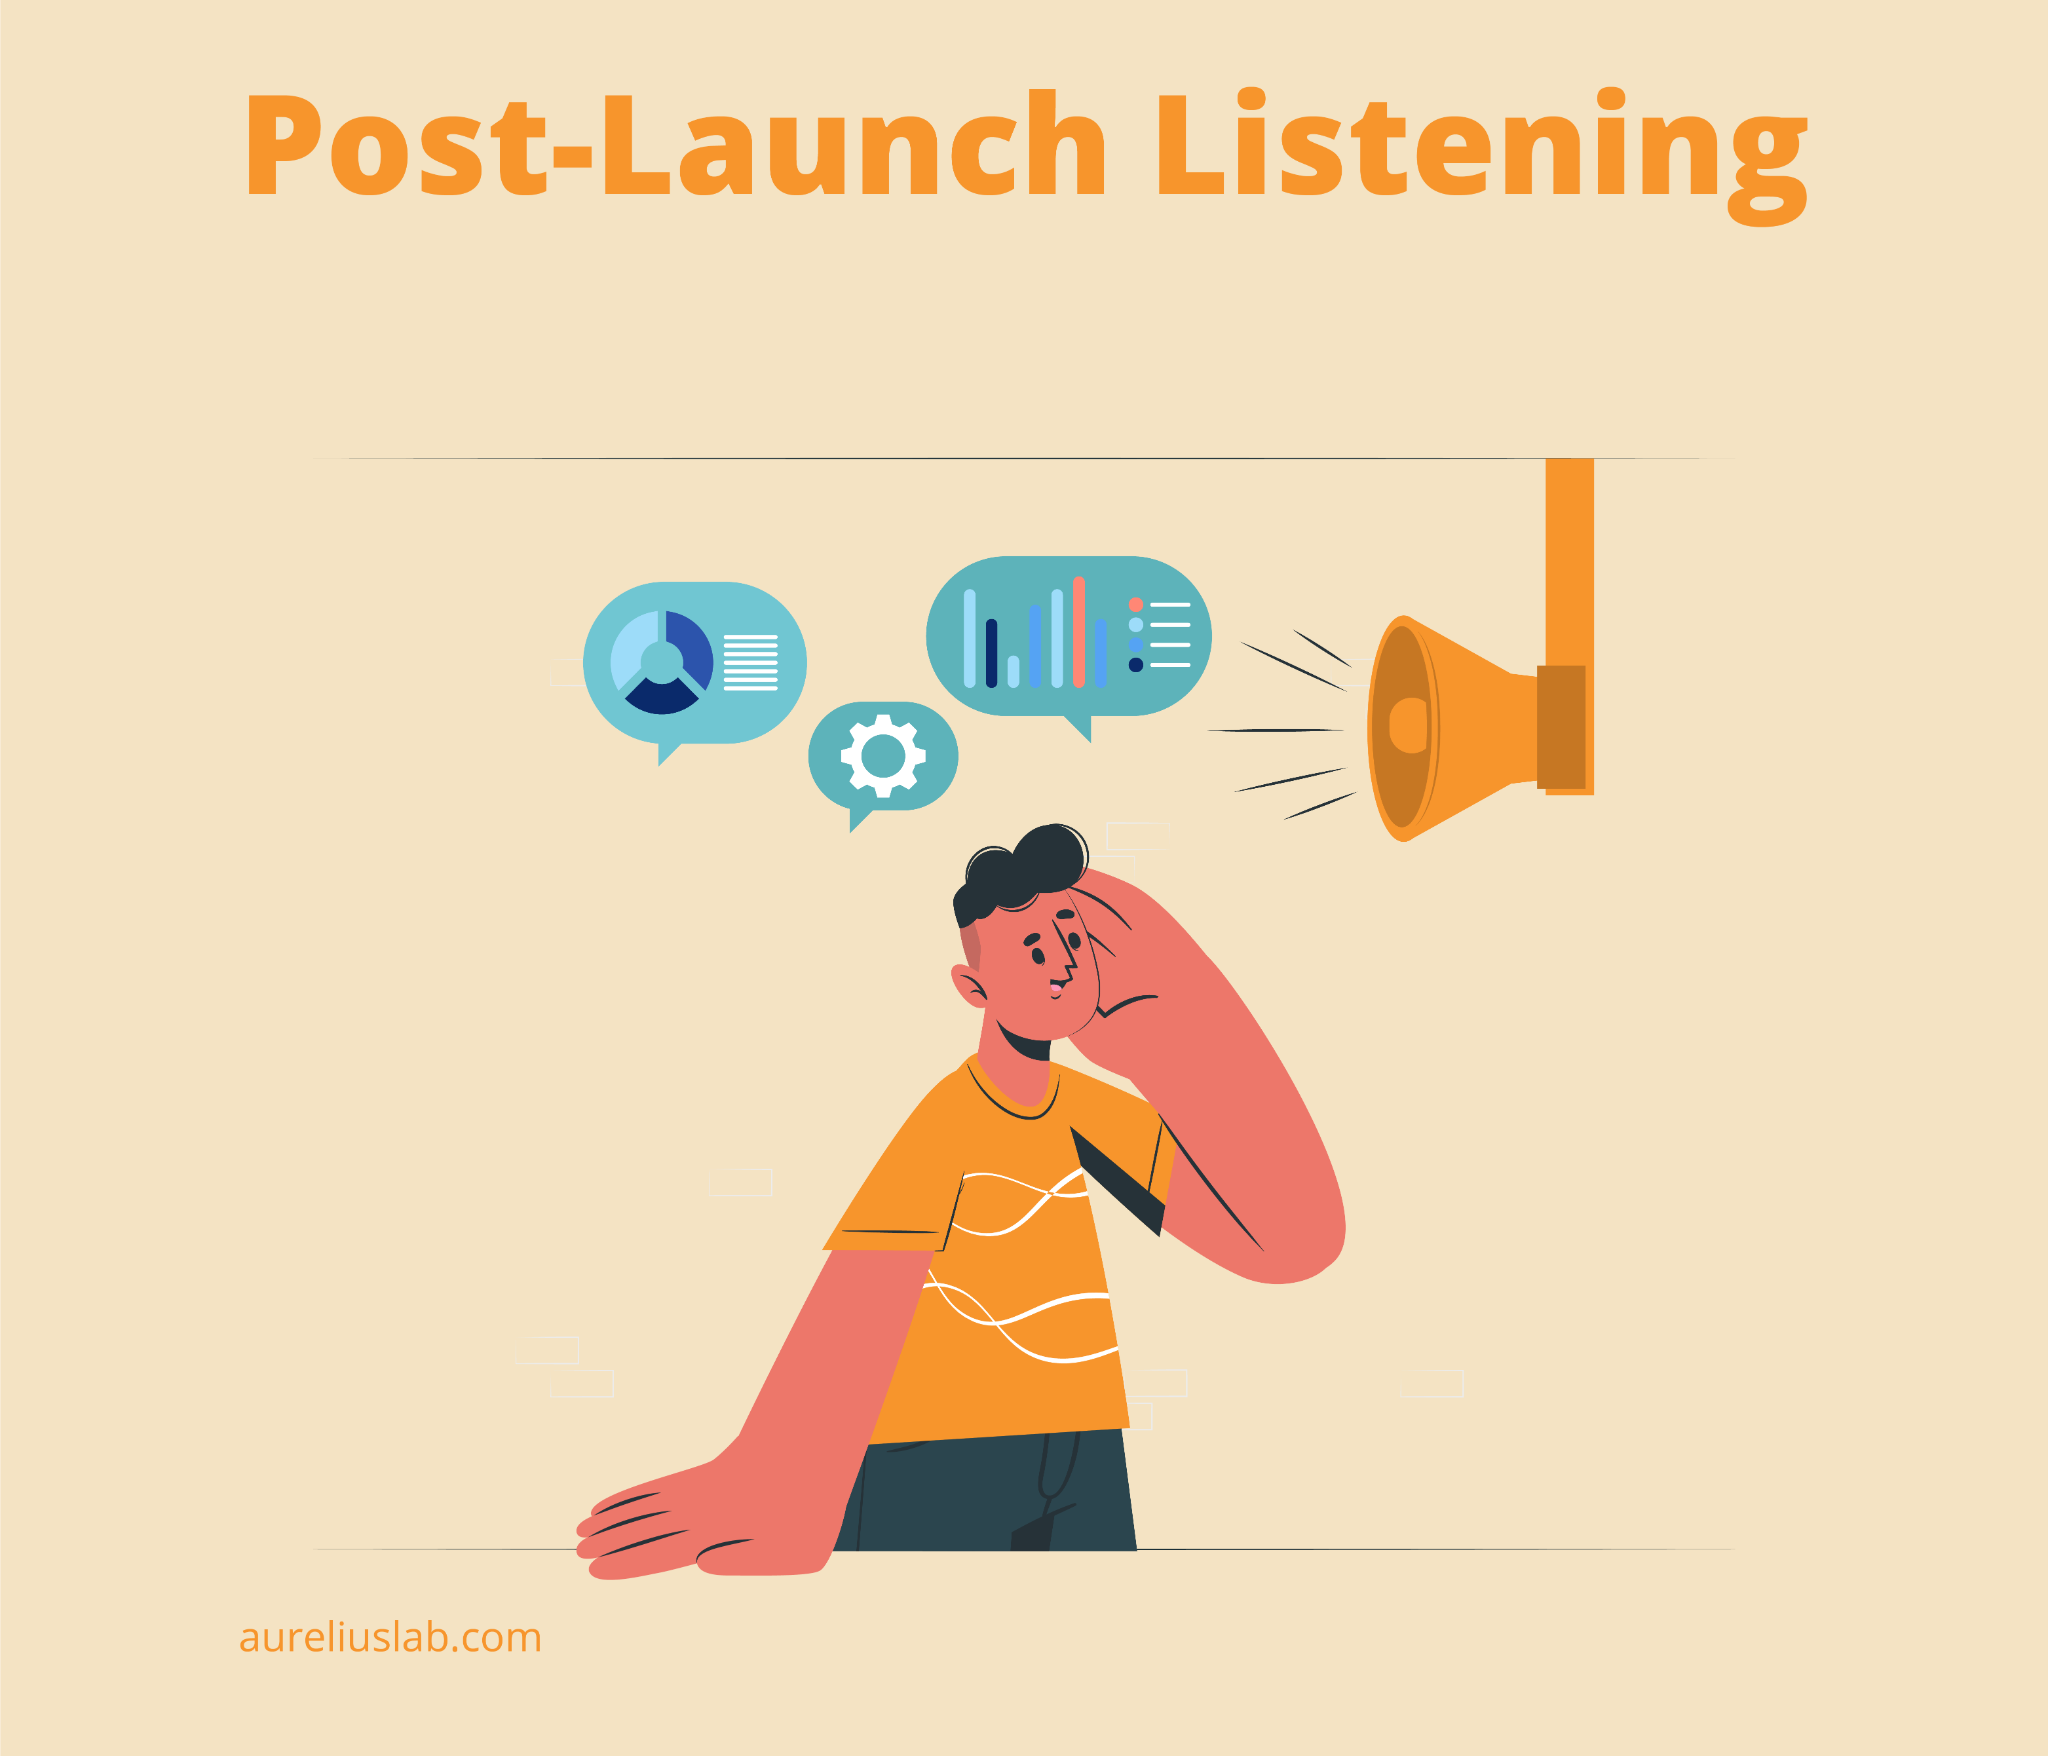 Post-launch listening